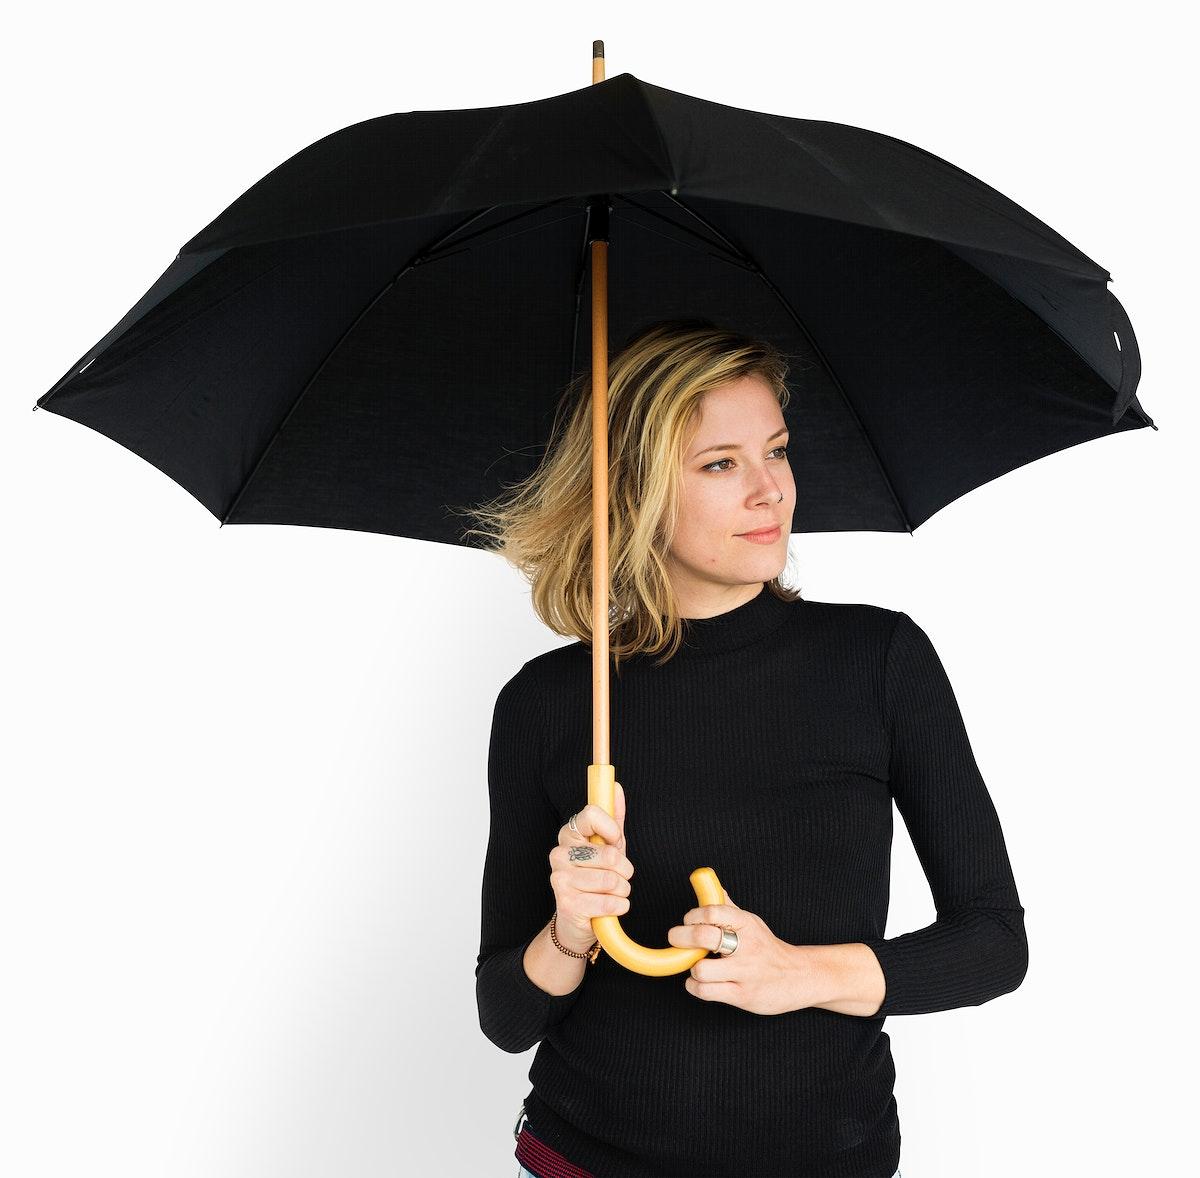 Woman Smiling Happiness Umbrella Portrait Concept